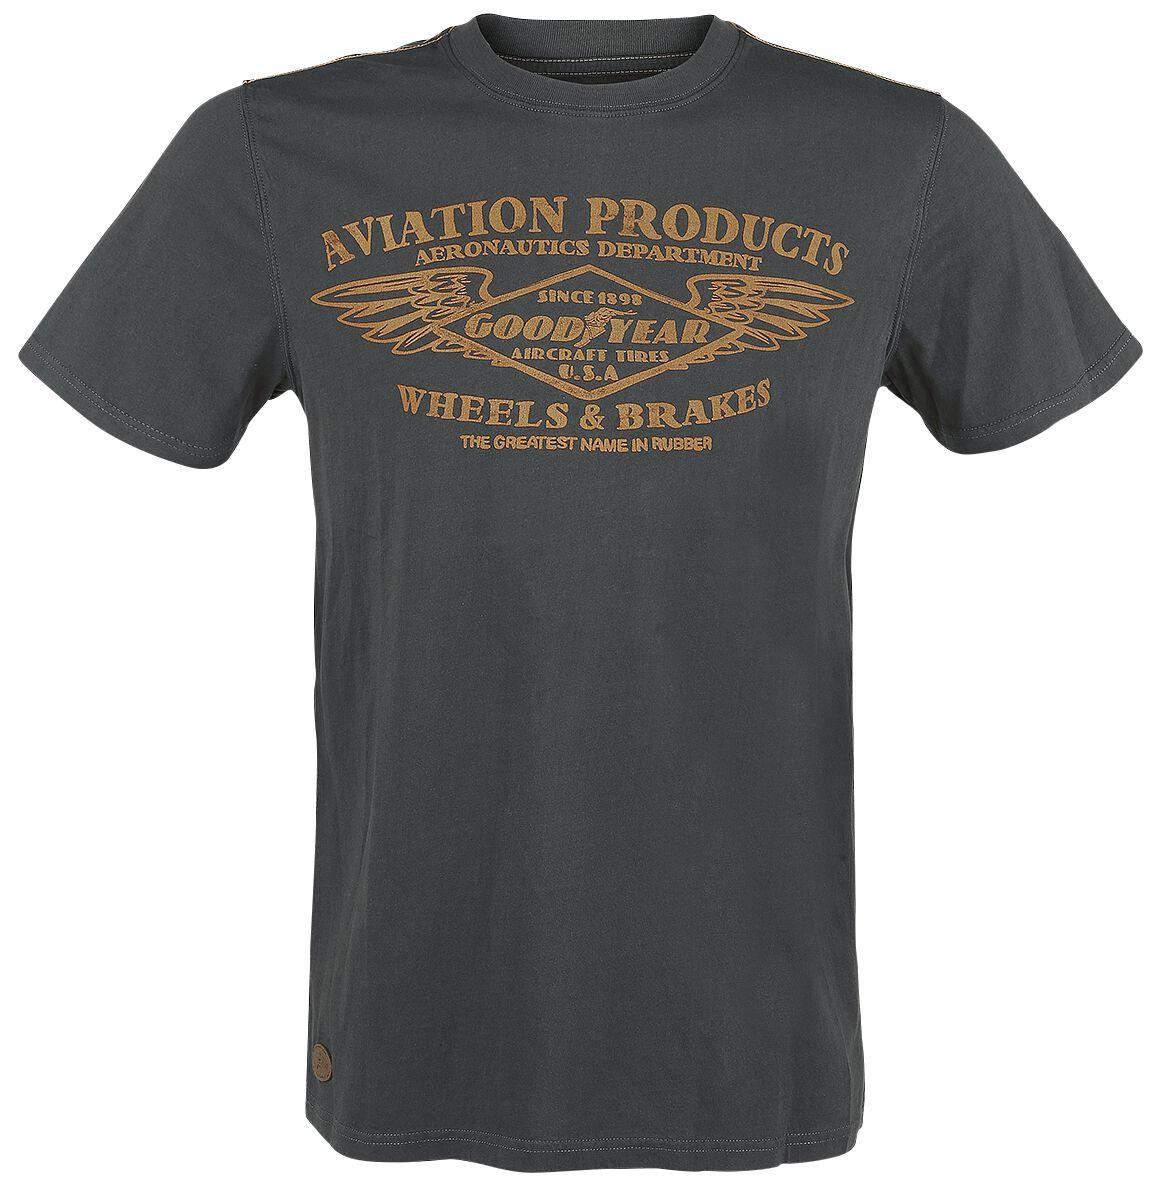 Marki - Koszulki - T-Shirt GoodYear Crawford T-Shirt ciemnoszary (Anthracite) - 338300